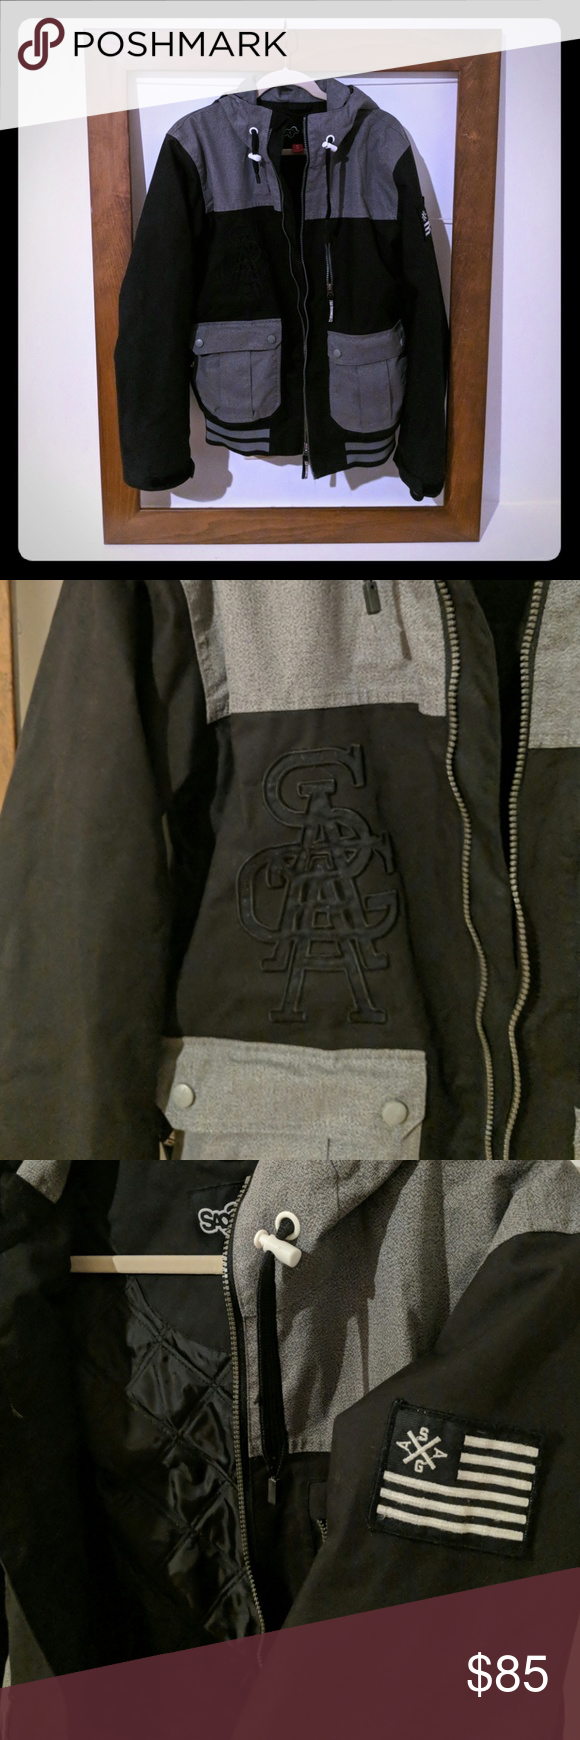 Saga Snow Boarding Jacket Saga Quilted Snow Boarding Jacket With Water Proof Outing Saga Jackets Coats Utility Jackets Jackets Utility Jacket Black And Grey [ 1740 x 580 Pixel ]